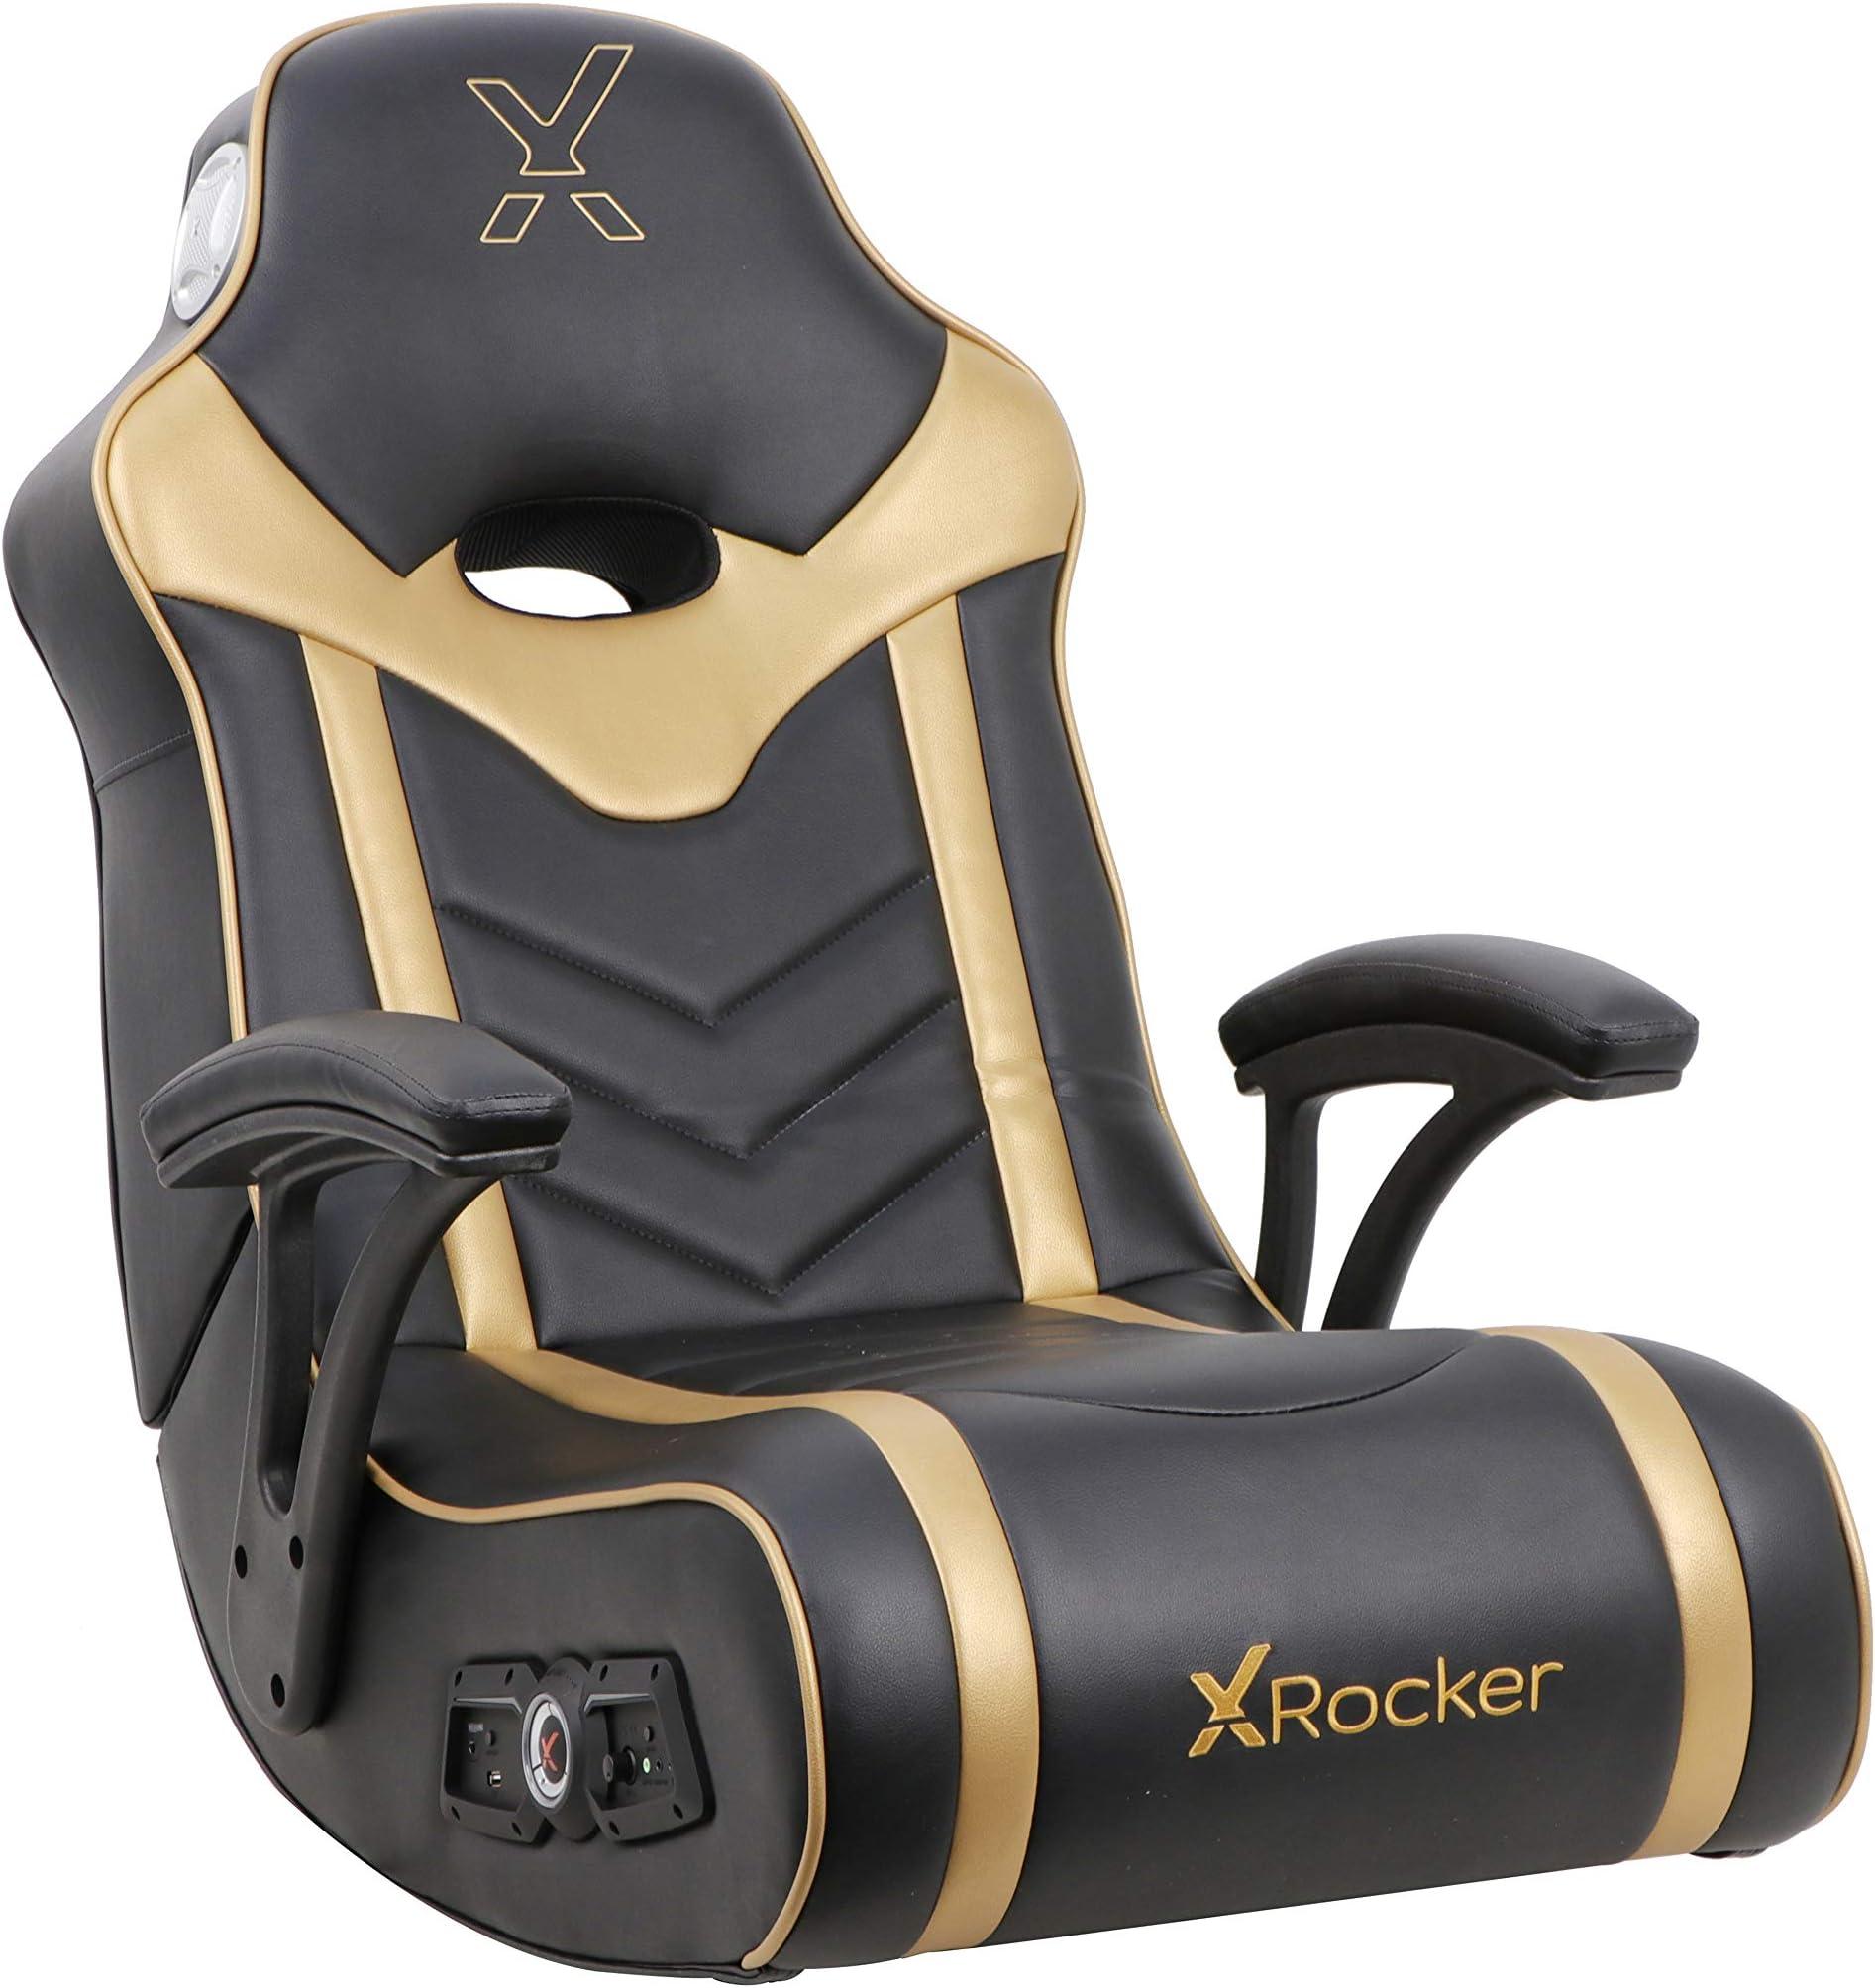 X Rocker, 5110501, 24K Floor Rocker 2.1 BT, 32 x 24.5 x 31.5, Black/Gold